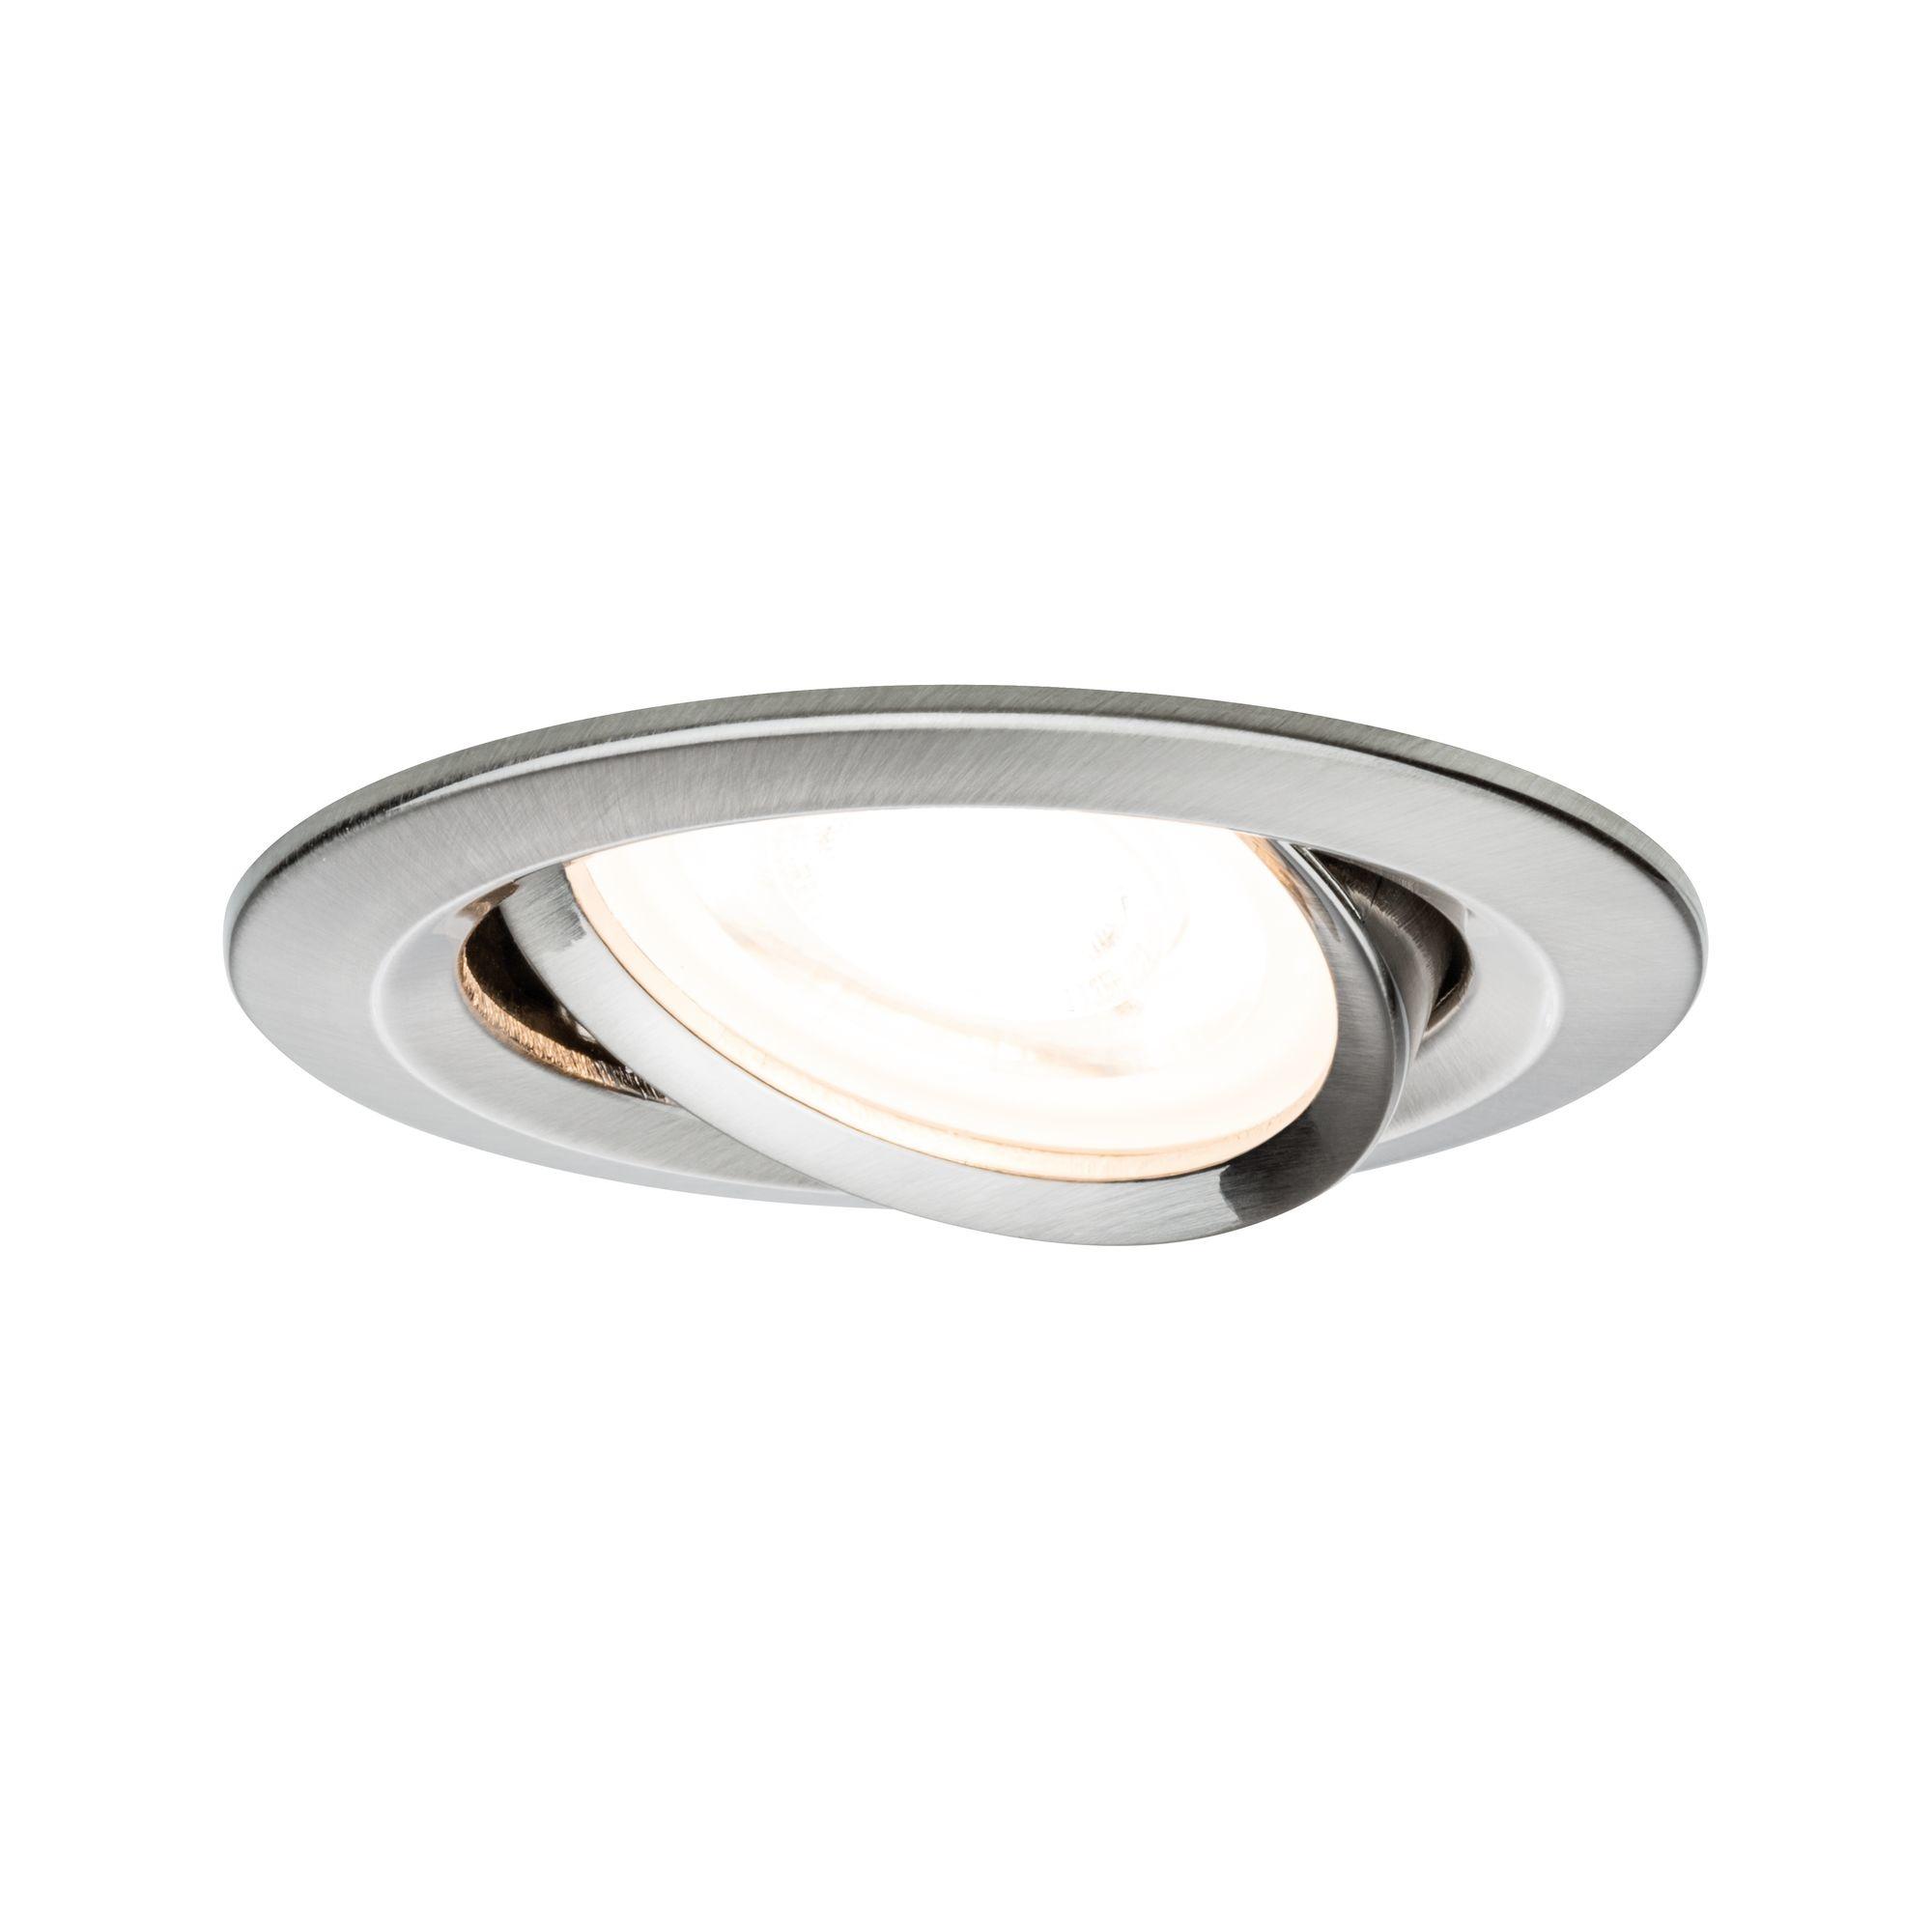 Paulmann EBL Set Nova rd schw LED 3stepdim 1x6,5W230V GU10 51mm Eisen geb/Alu